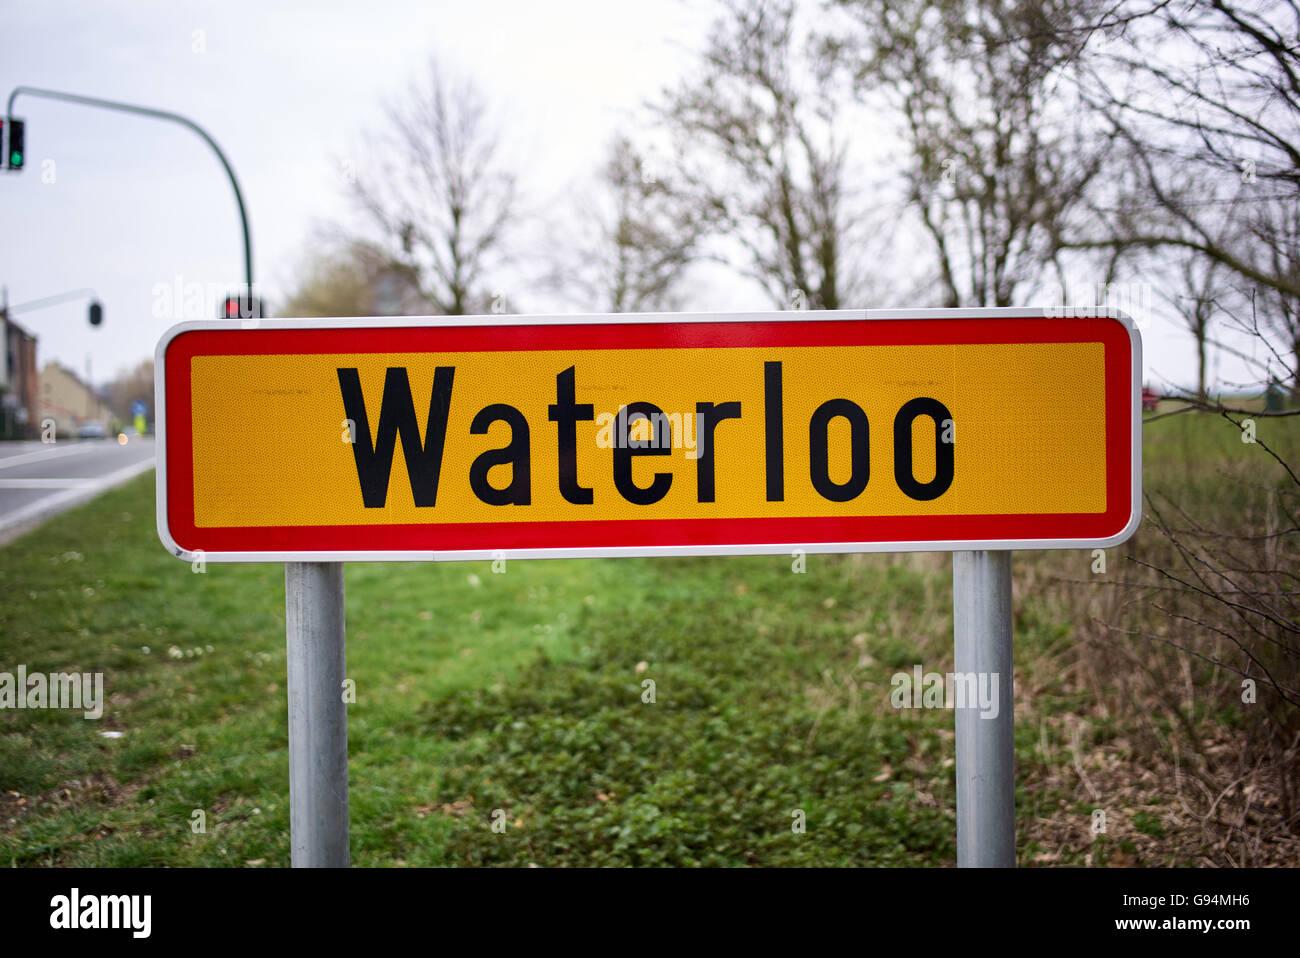 The site of the battlefield of Waterloo in Belgium - Stock Image